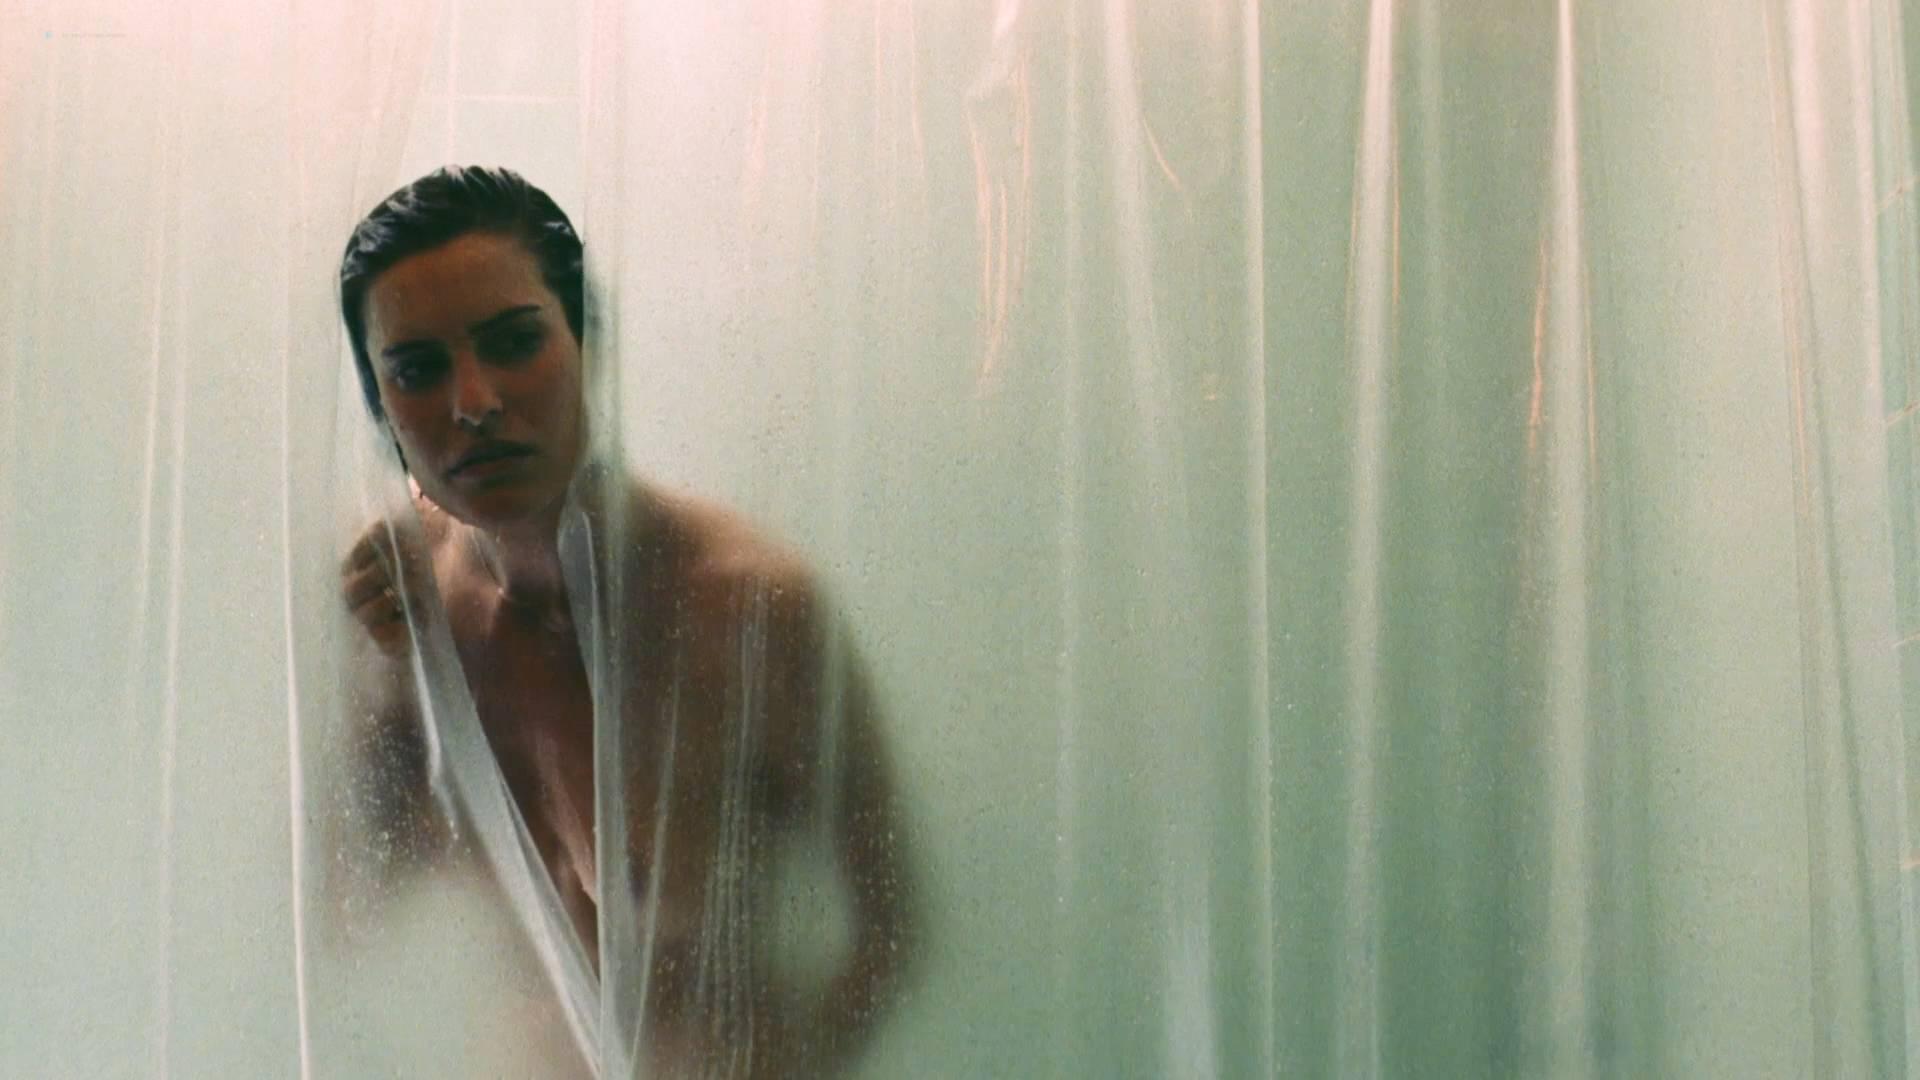 Denice Duff nude bush in the shower Melanie Shatner nude boobs - Bloodstone: Subspecies II (1993) HD 1080p BluRay (4)